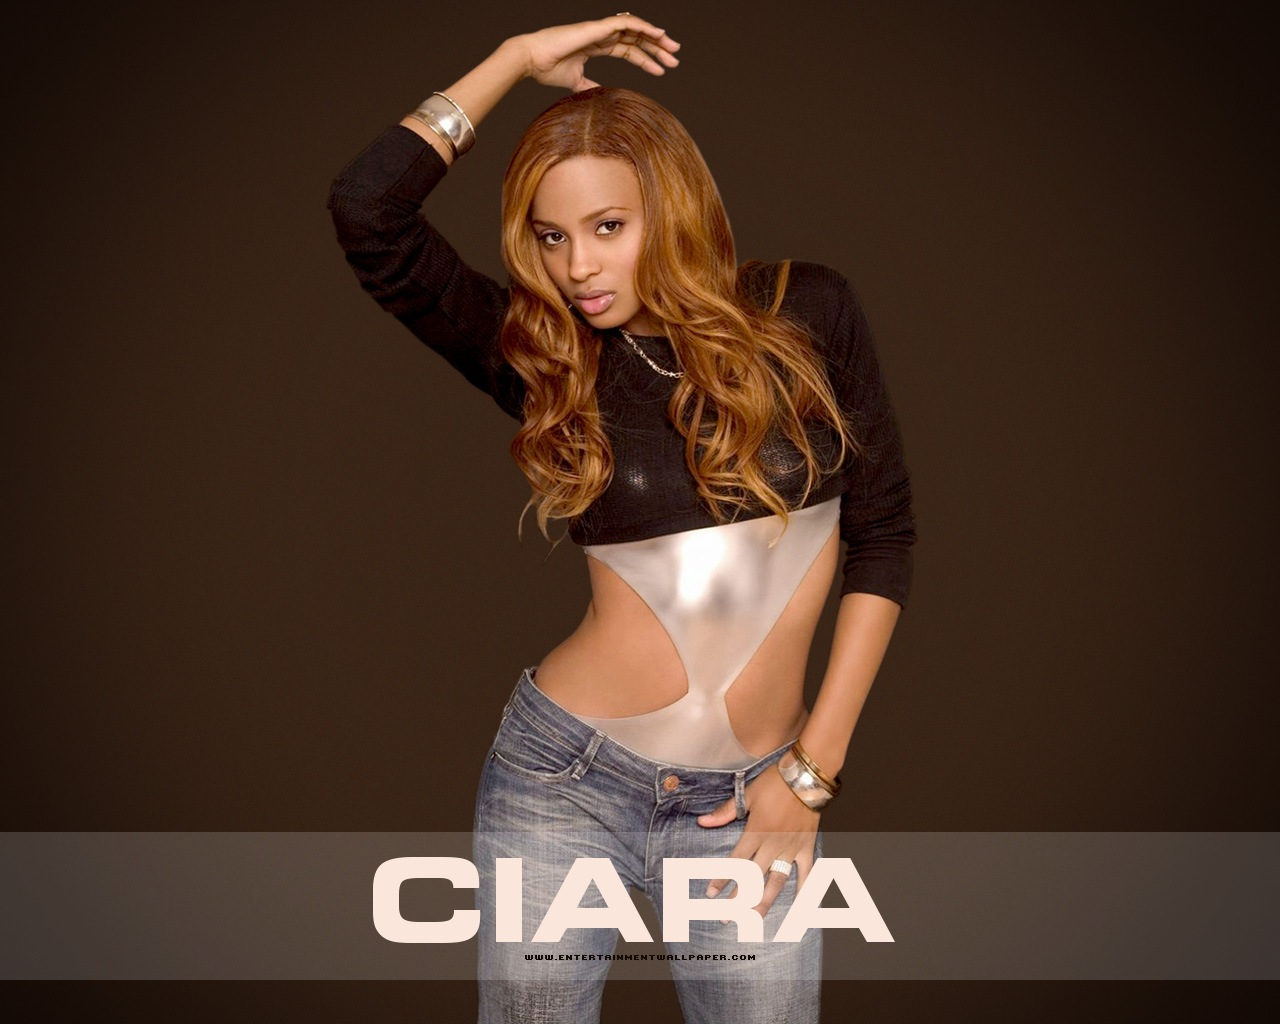 Fotos de Ciara - Ciara Princess Harris